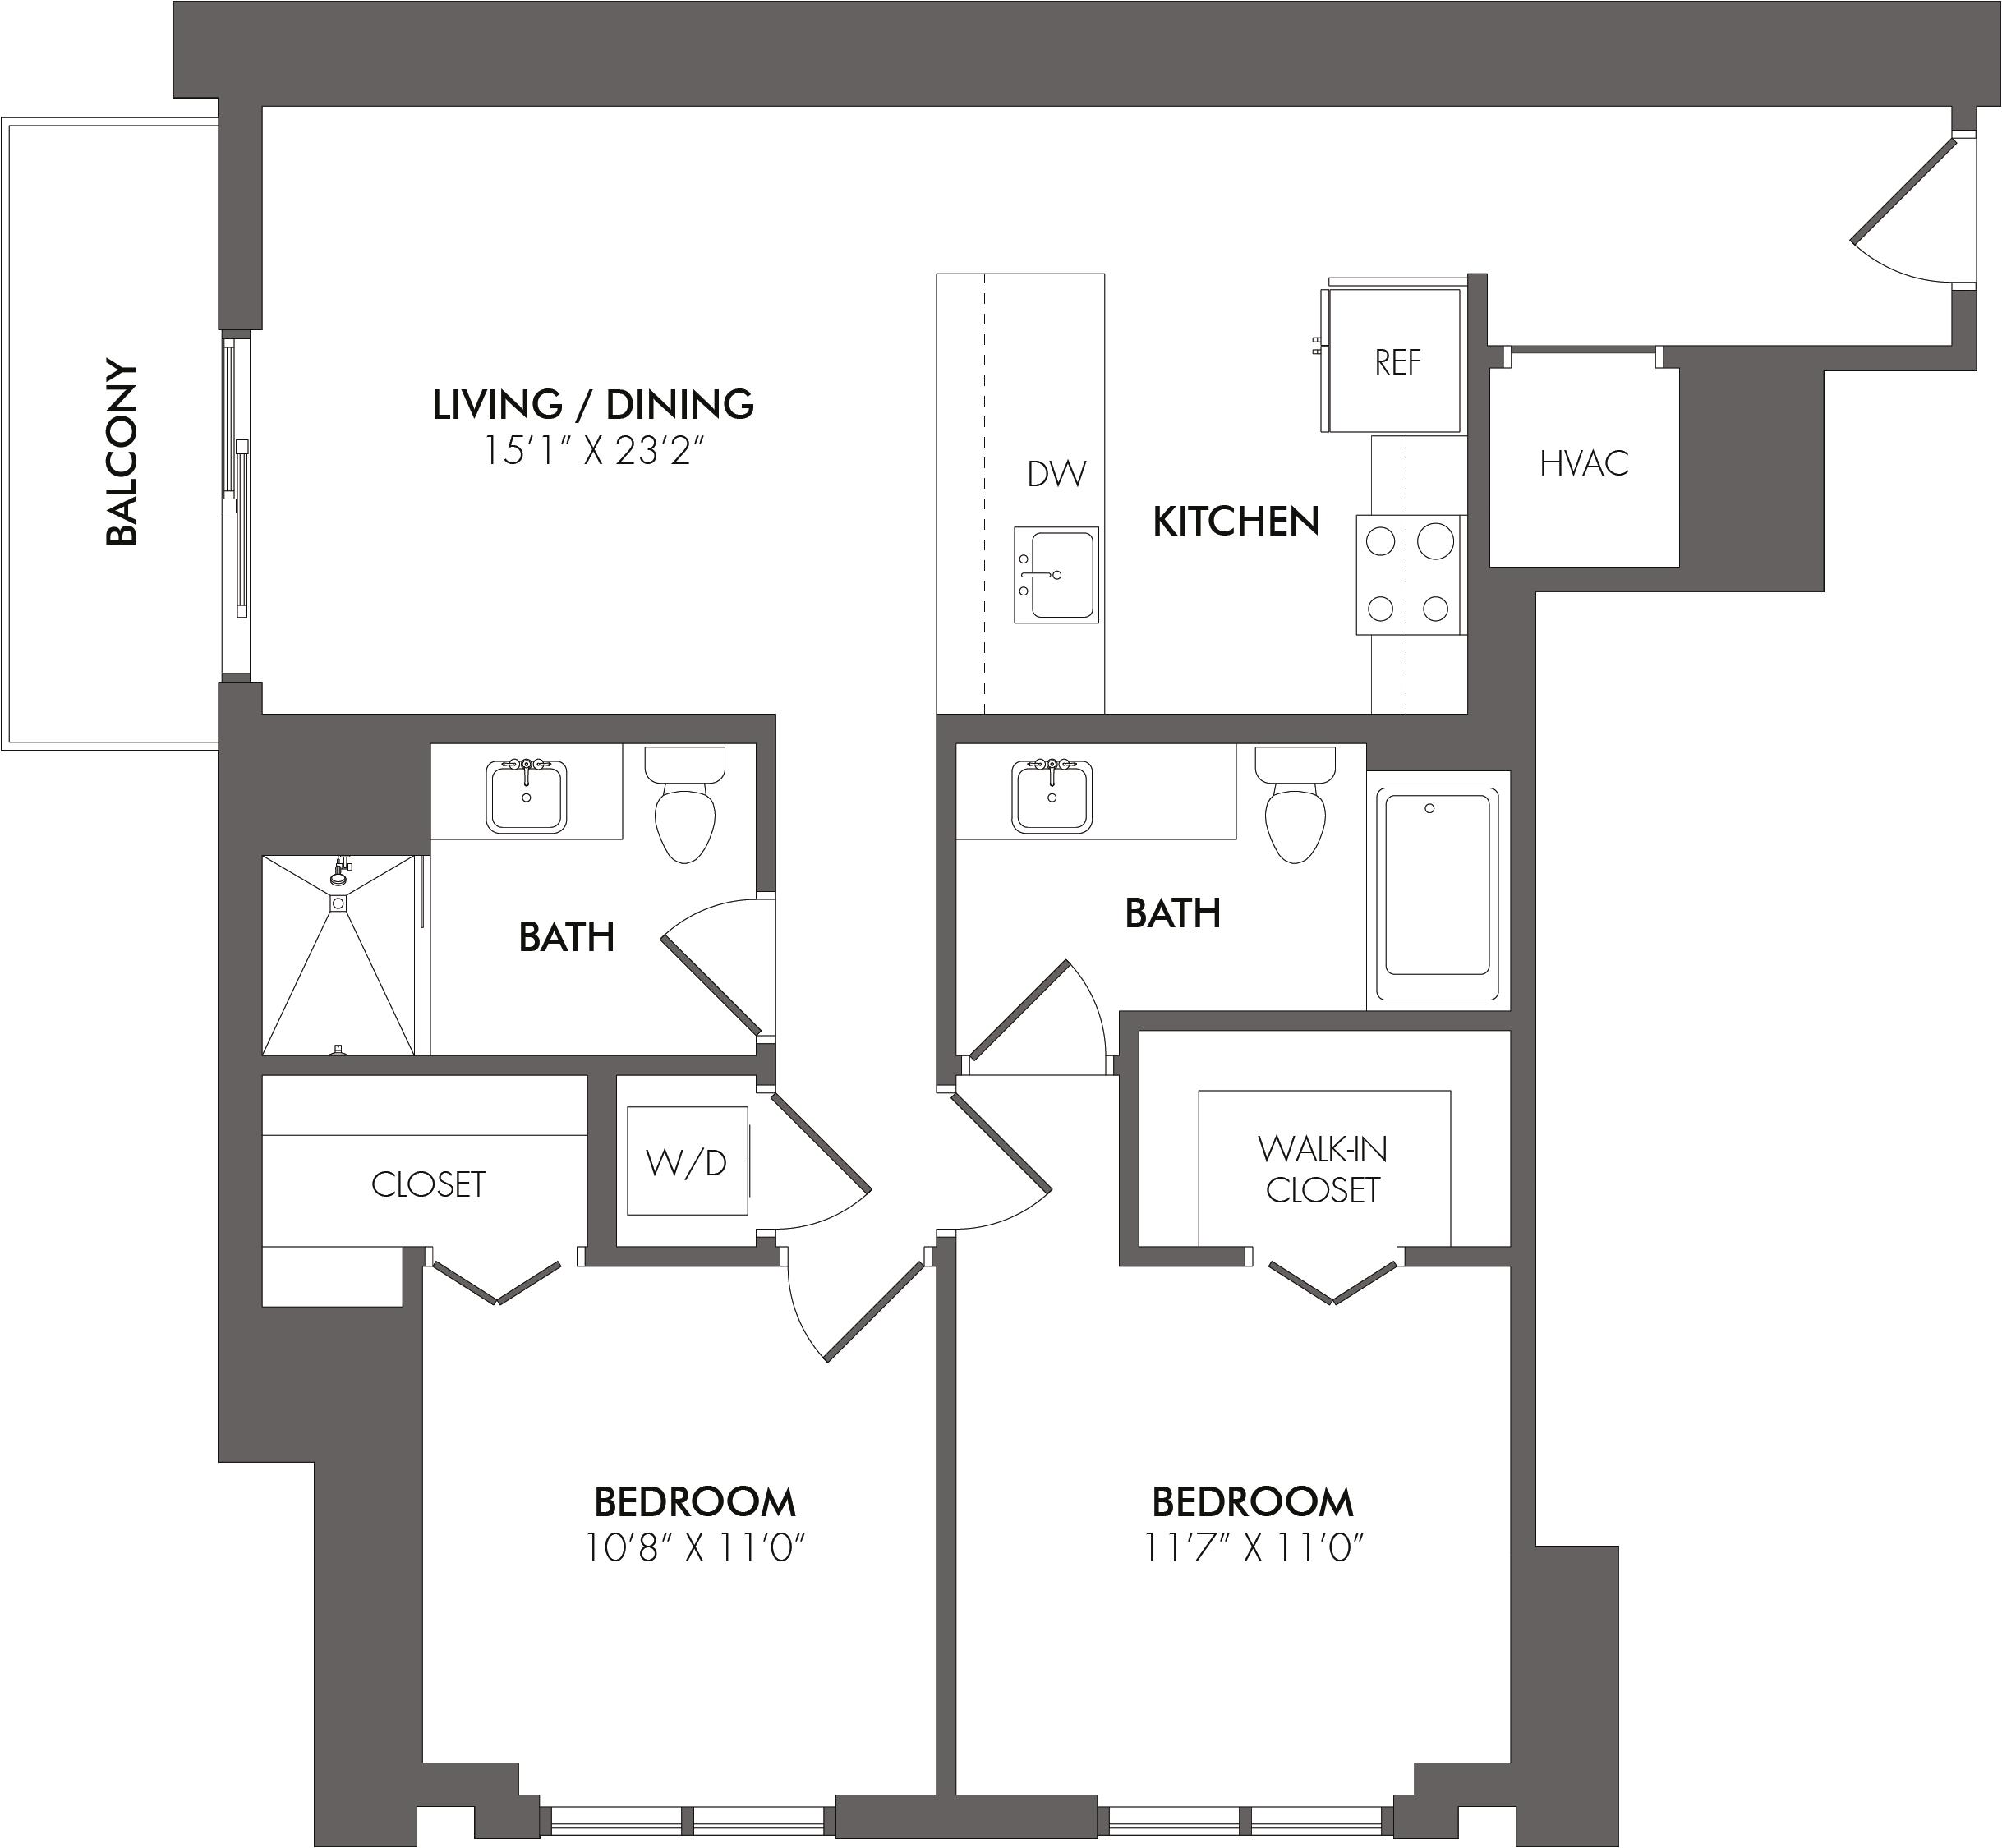 Apartment 4001 floorplan